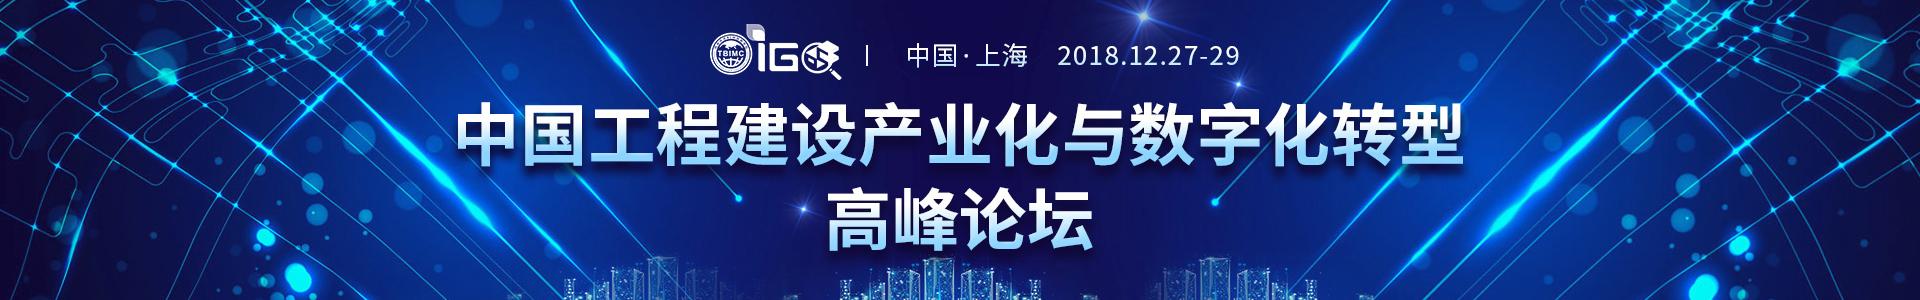 http://igreenbuy-zhaopc-public.oss-cn-shanghai.aliyuncs.com/common/20181127110938_86875.jpg